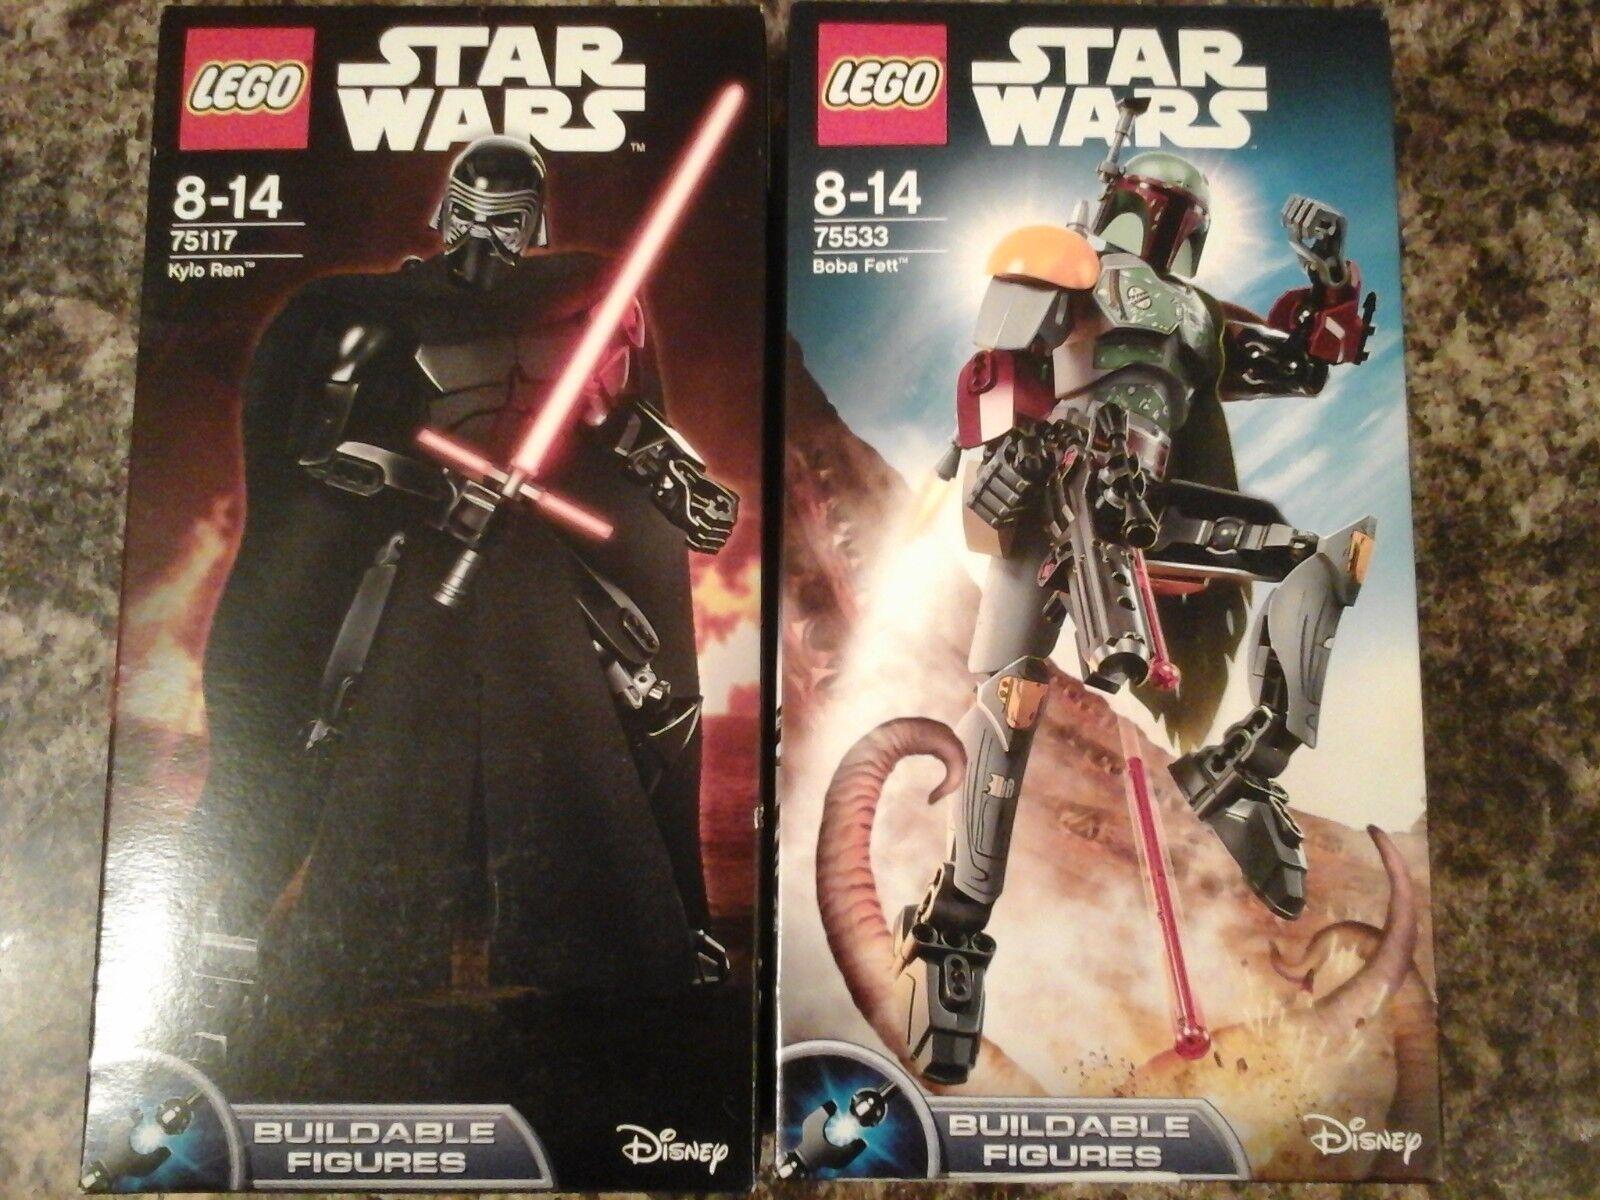 LEGO Star Wars Boba Fett - Kylo Ren Buildable Figures 75533 75117 NEW